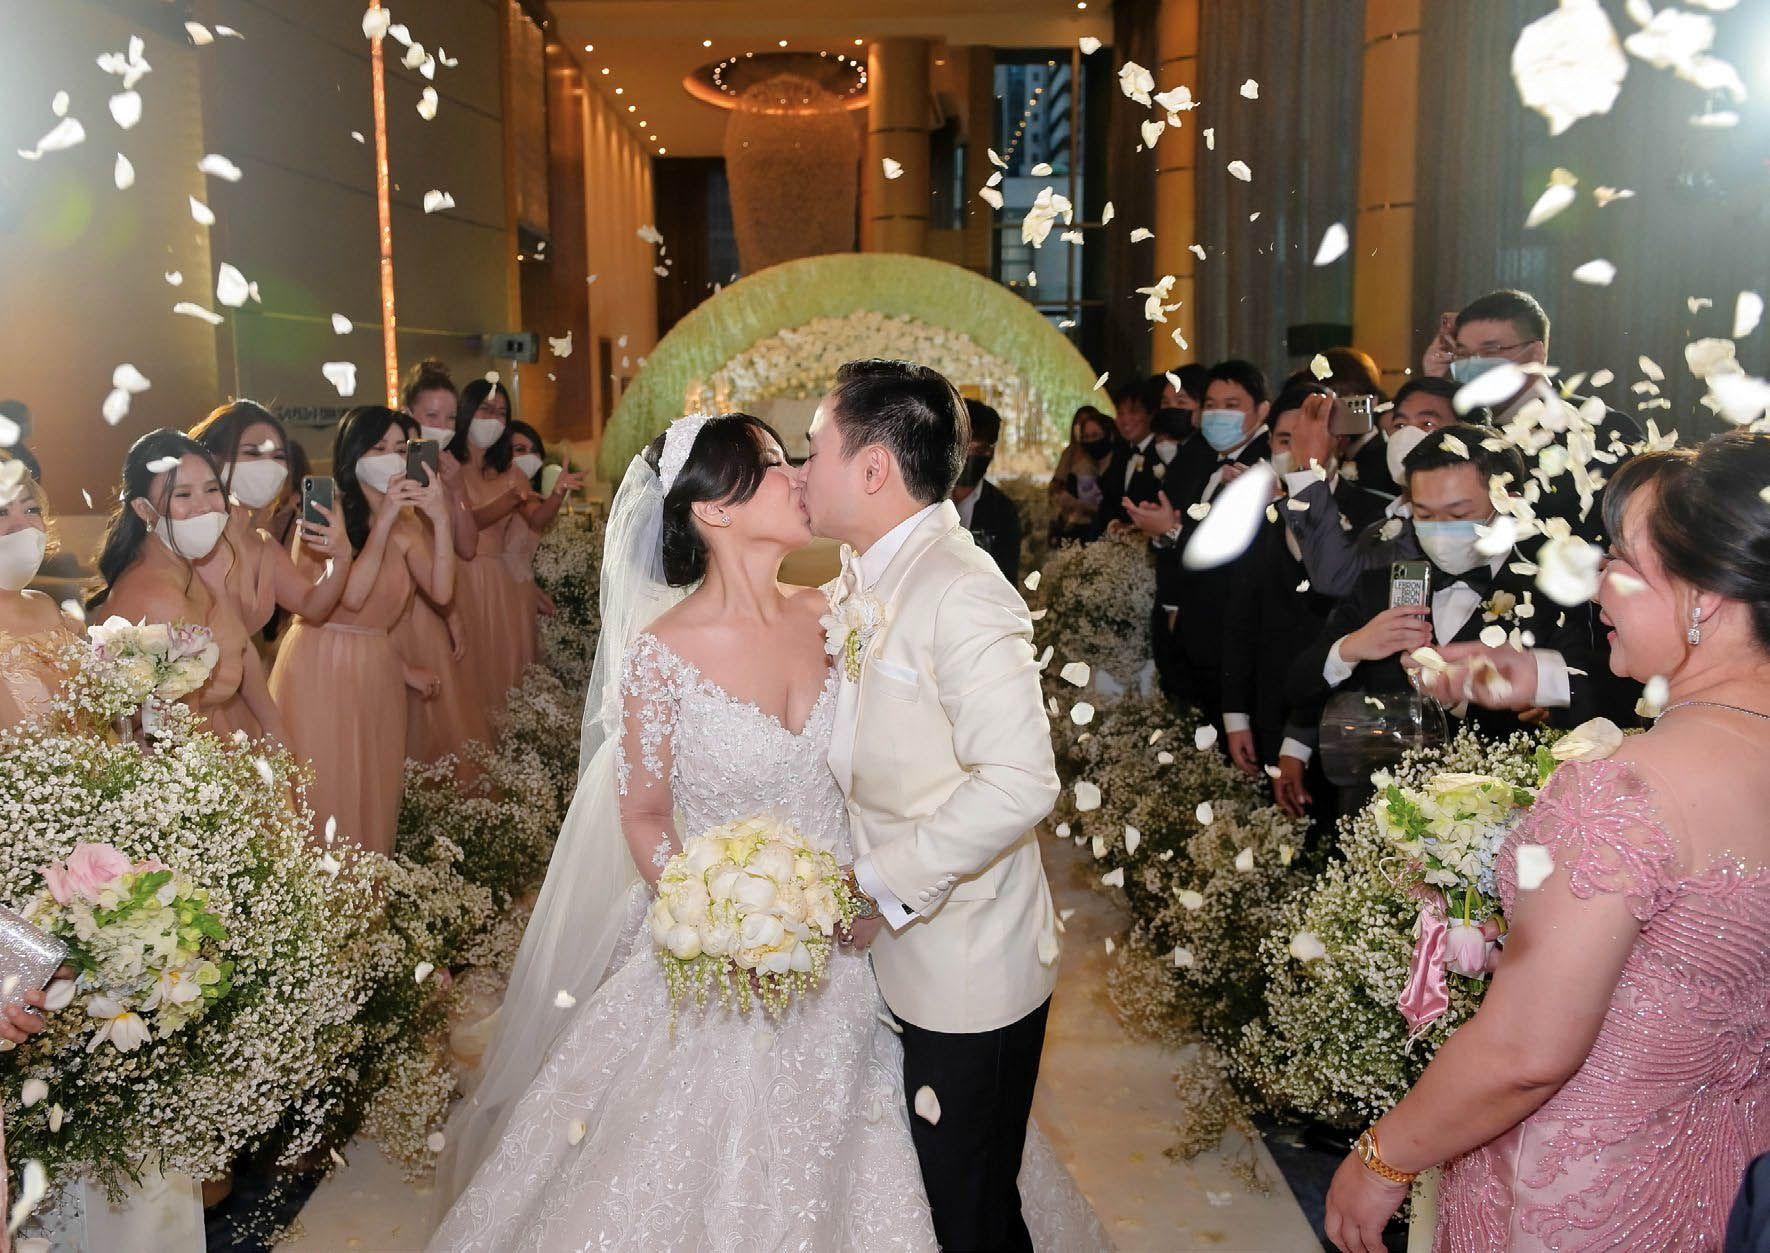 Tatler Weddings: Robert Tan And Rachel Felicia Celebrate An Everlasting Union